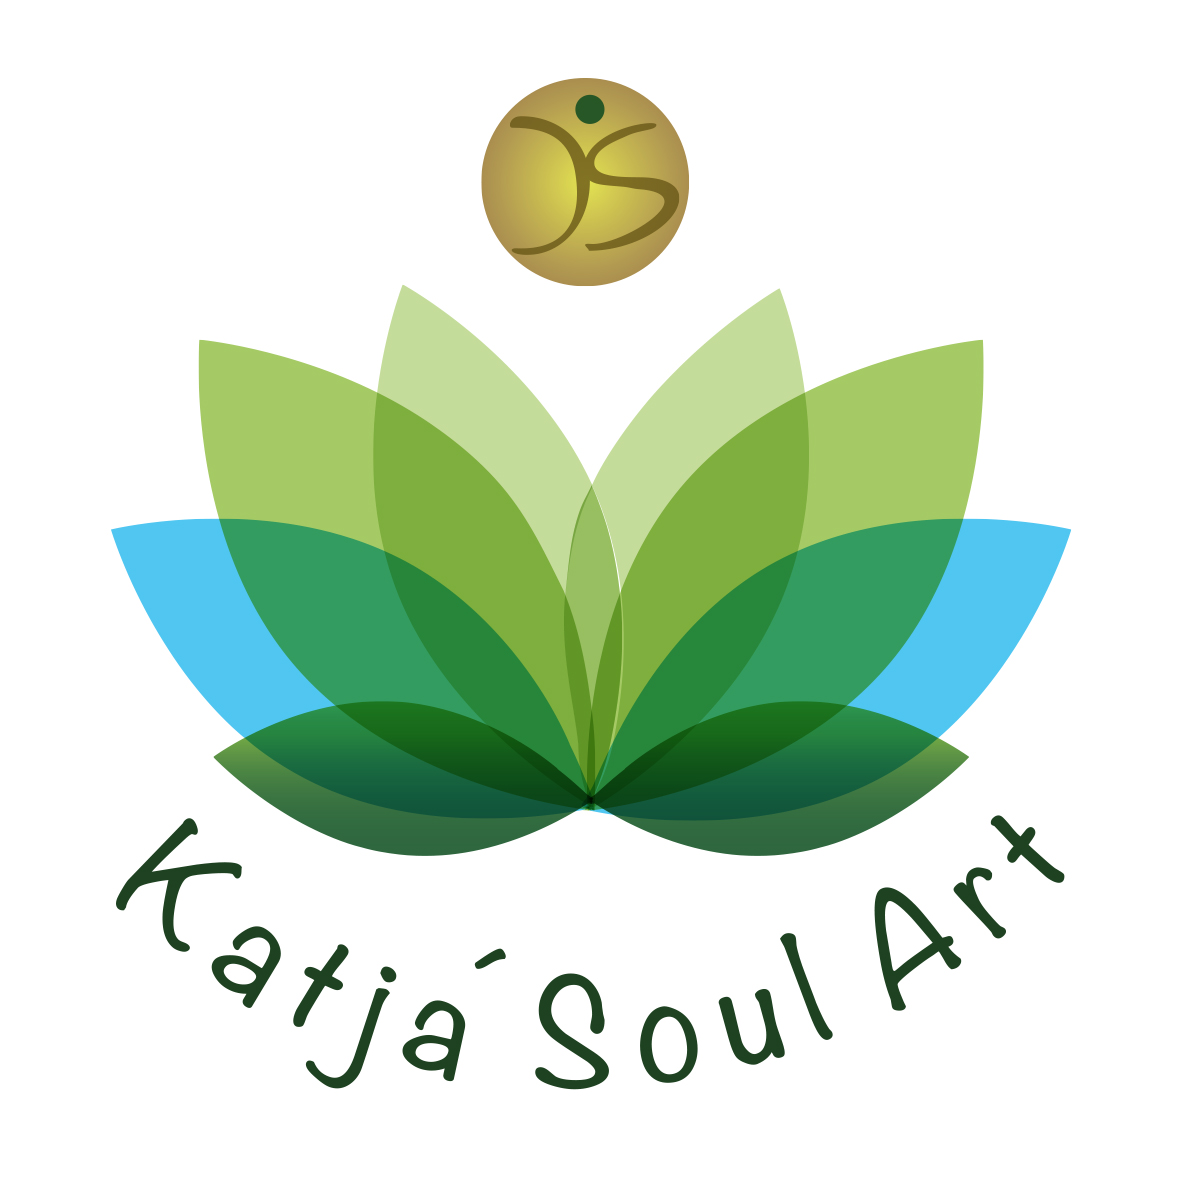 Katja Soulart